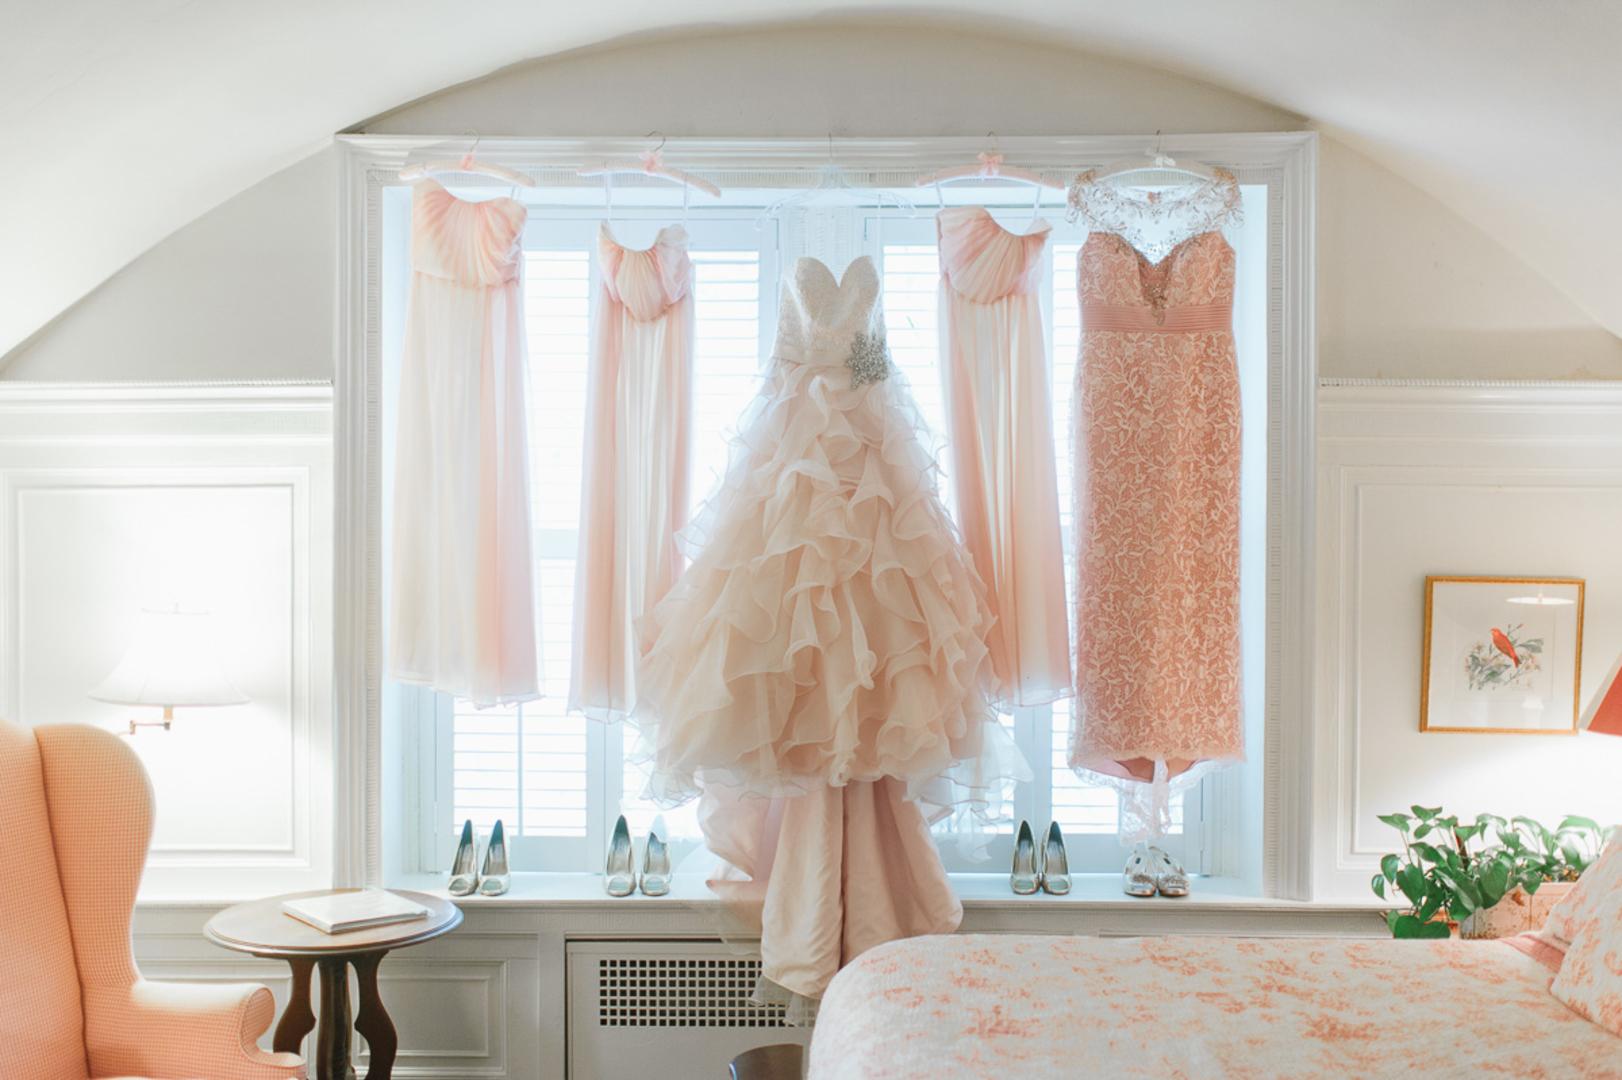 mansfield-plantation-wedding-2.jpg